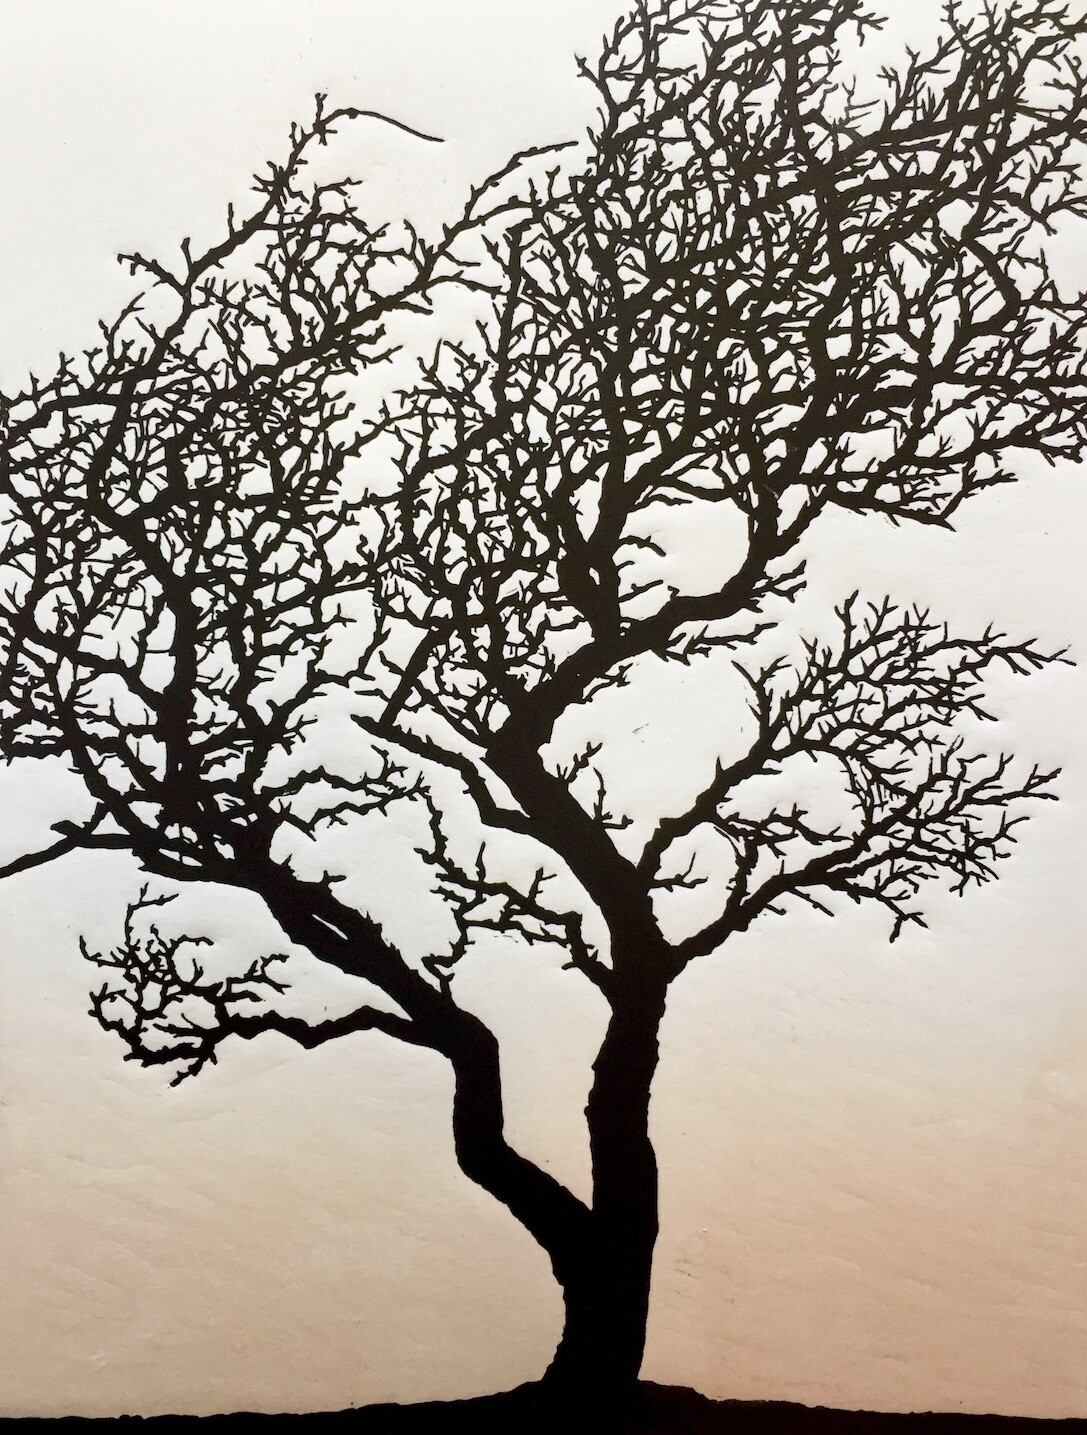 Hawthorn 2, by Richard Shimell